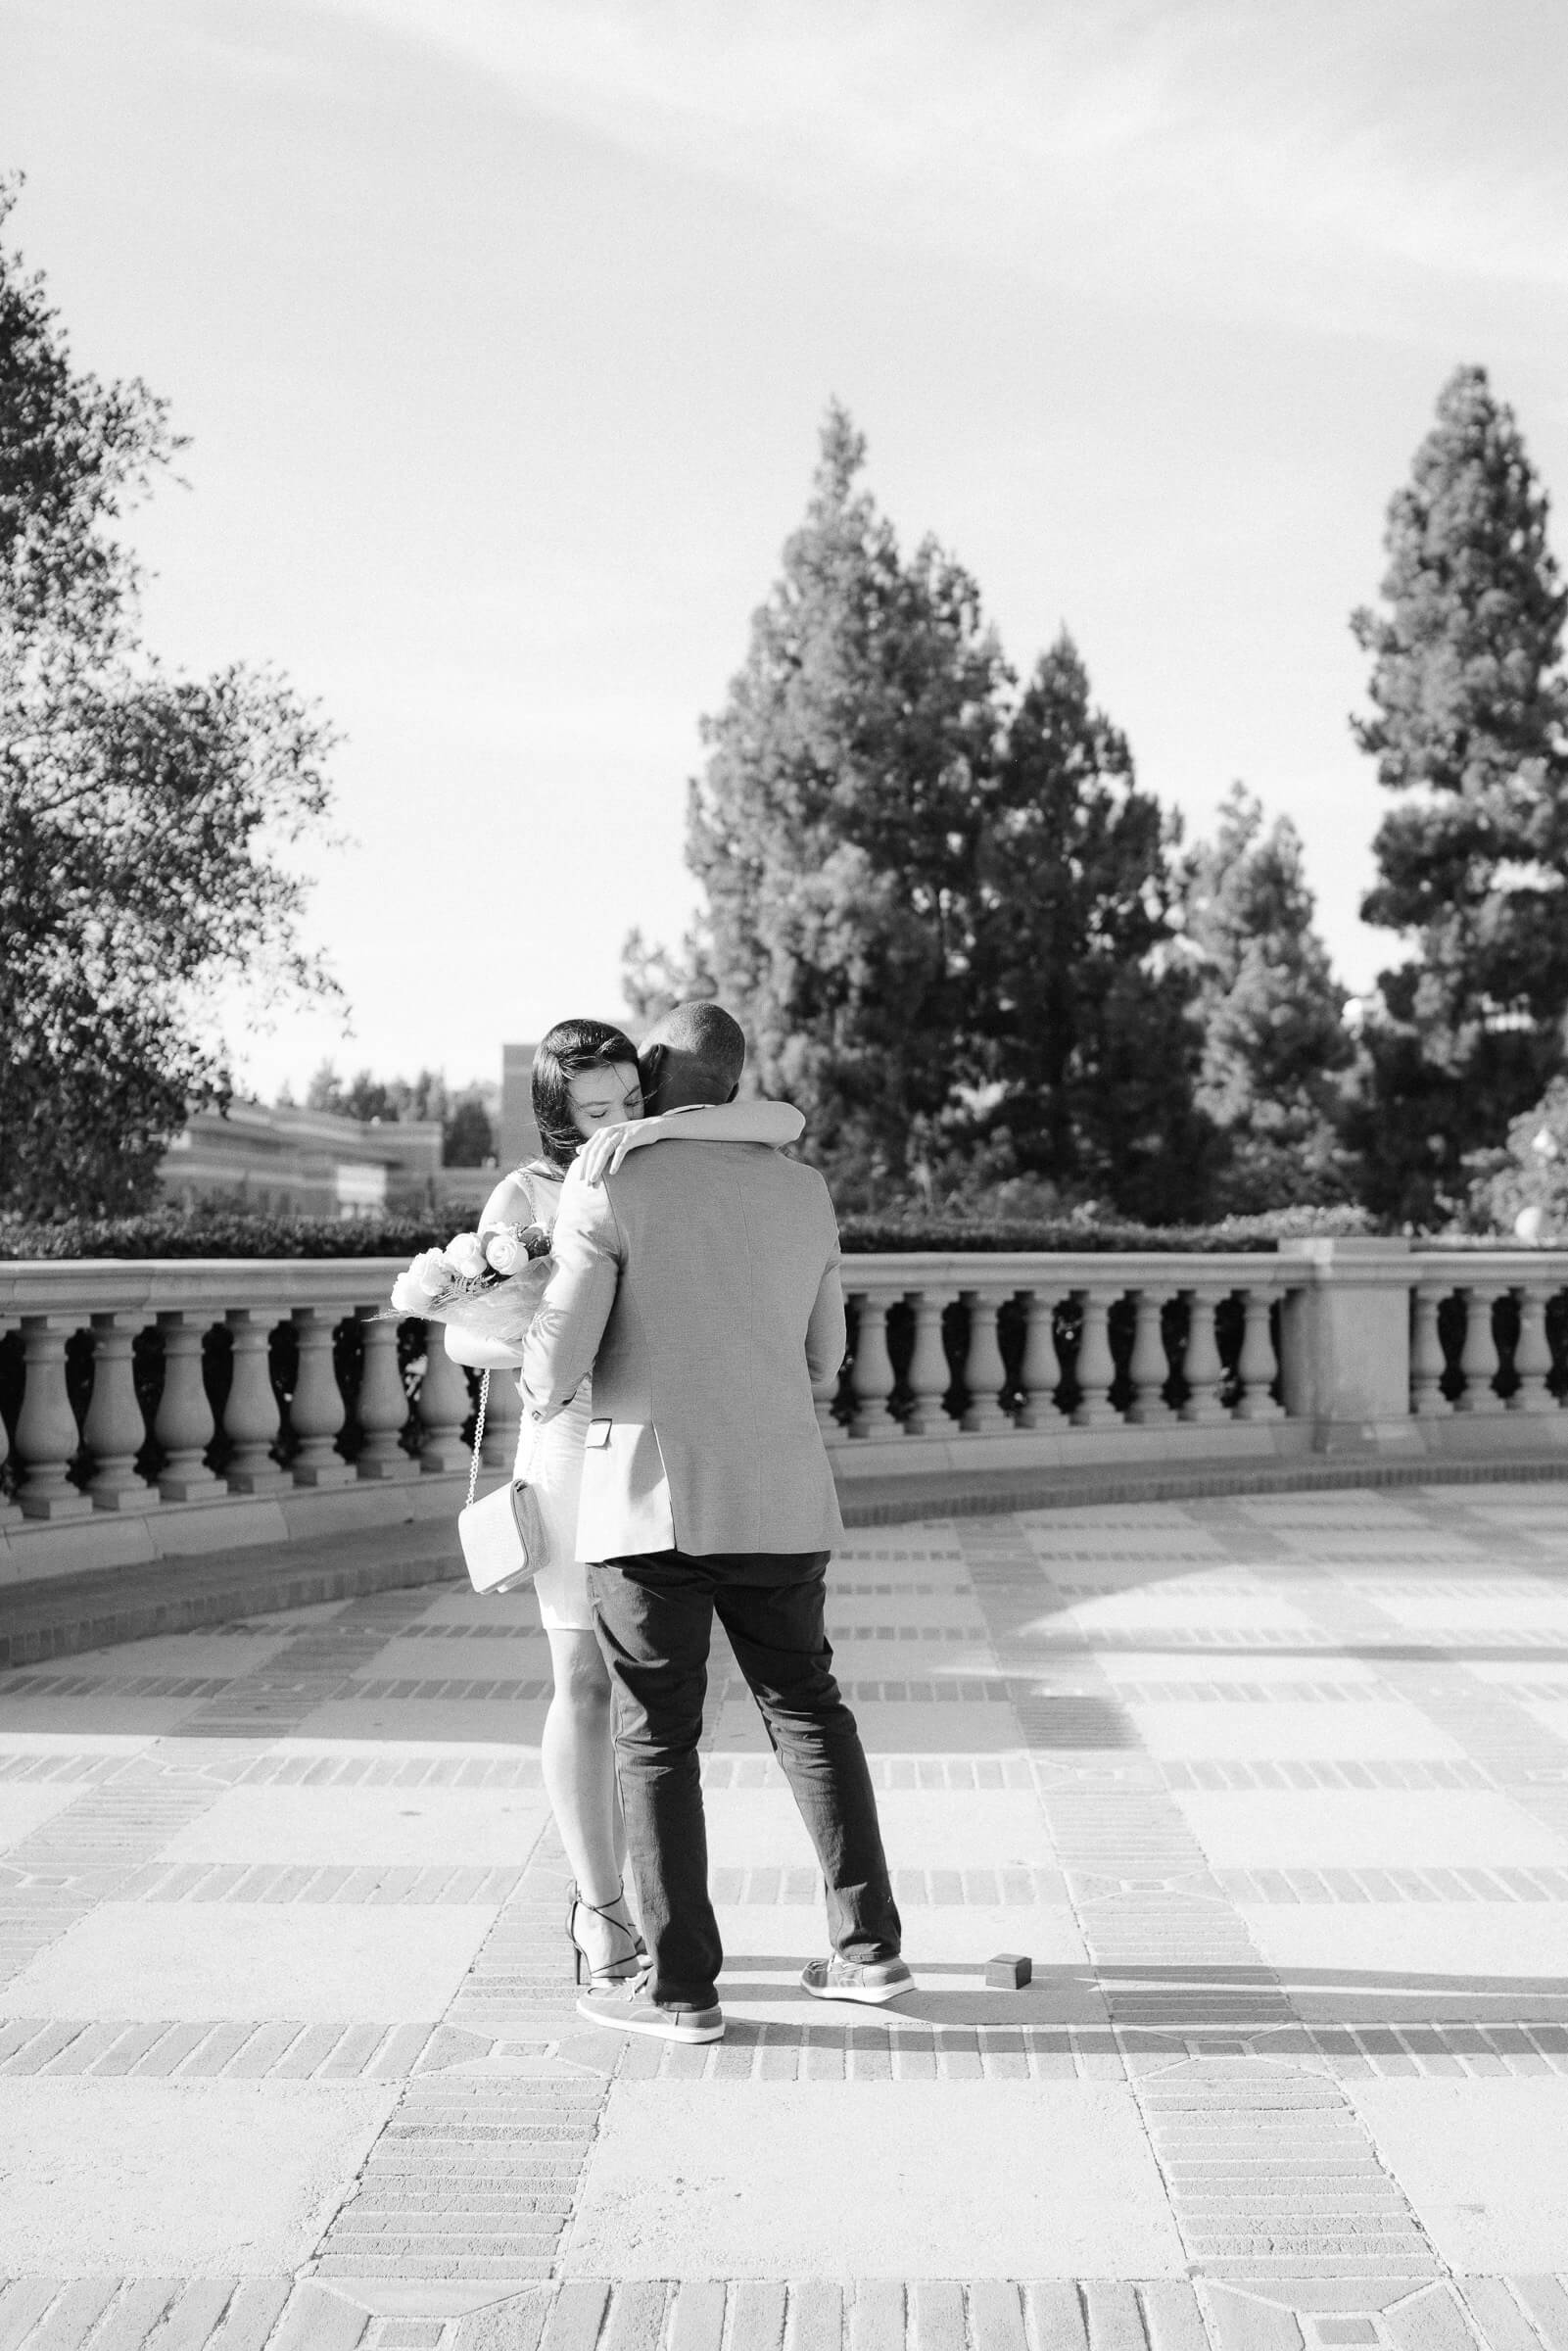 ucla-los-angeles-proposal-photographer-15.jpg